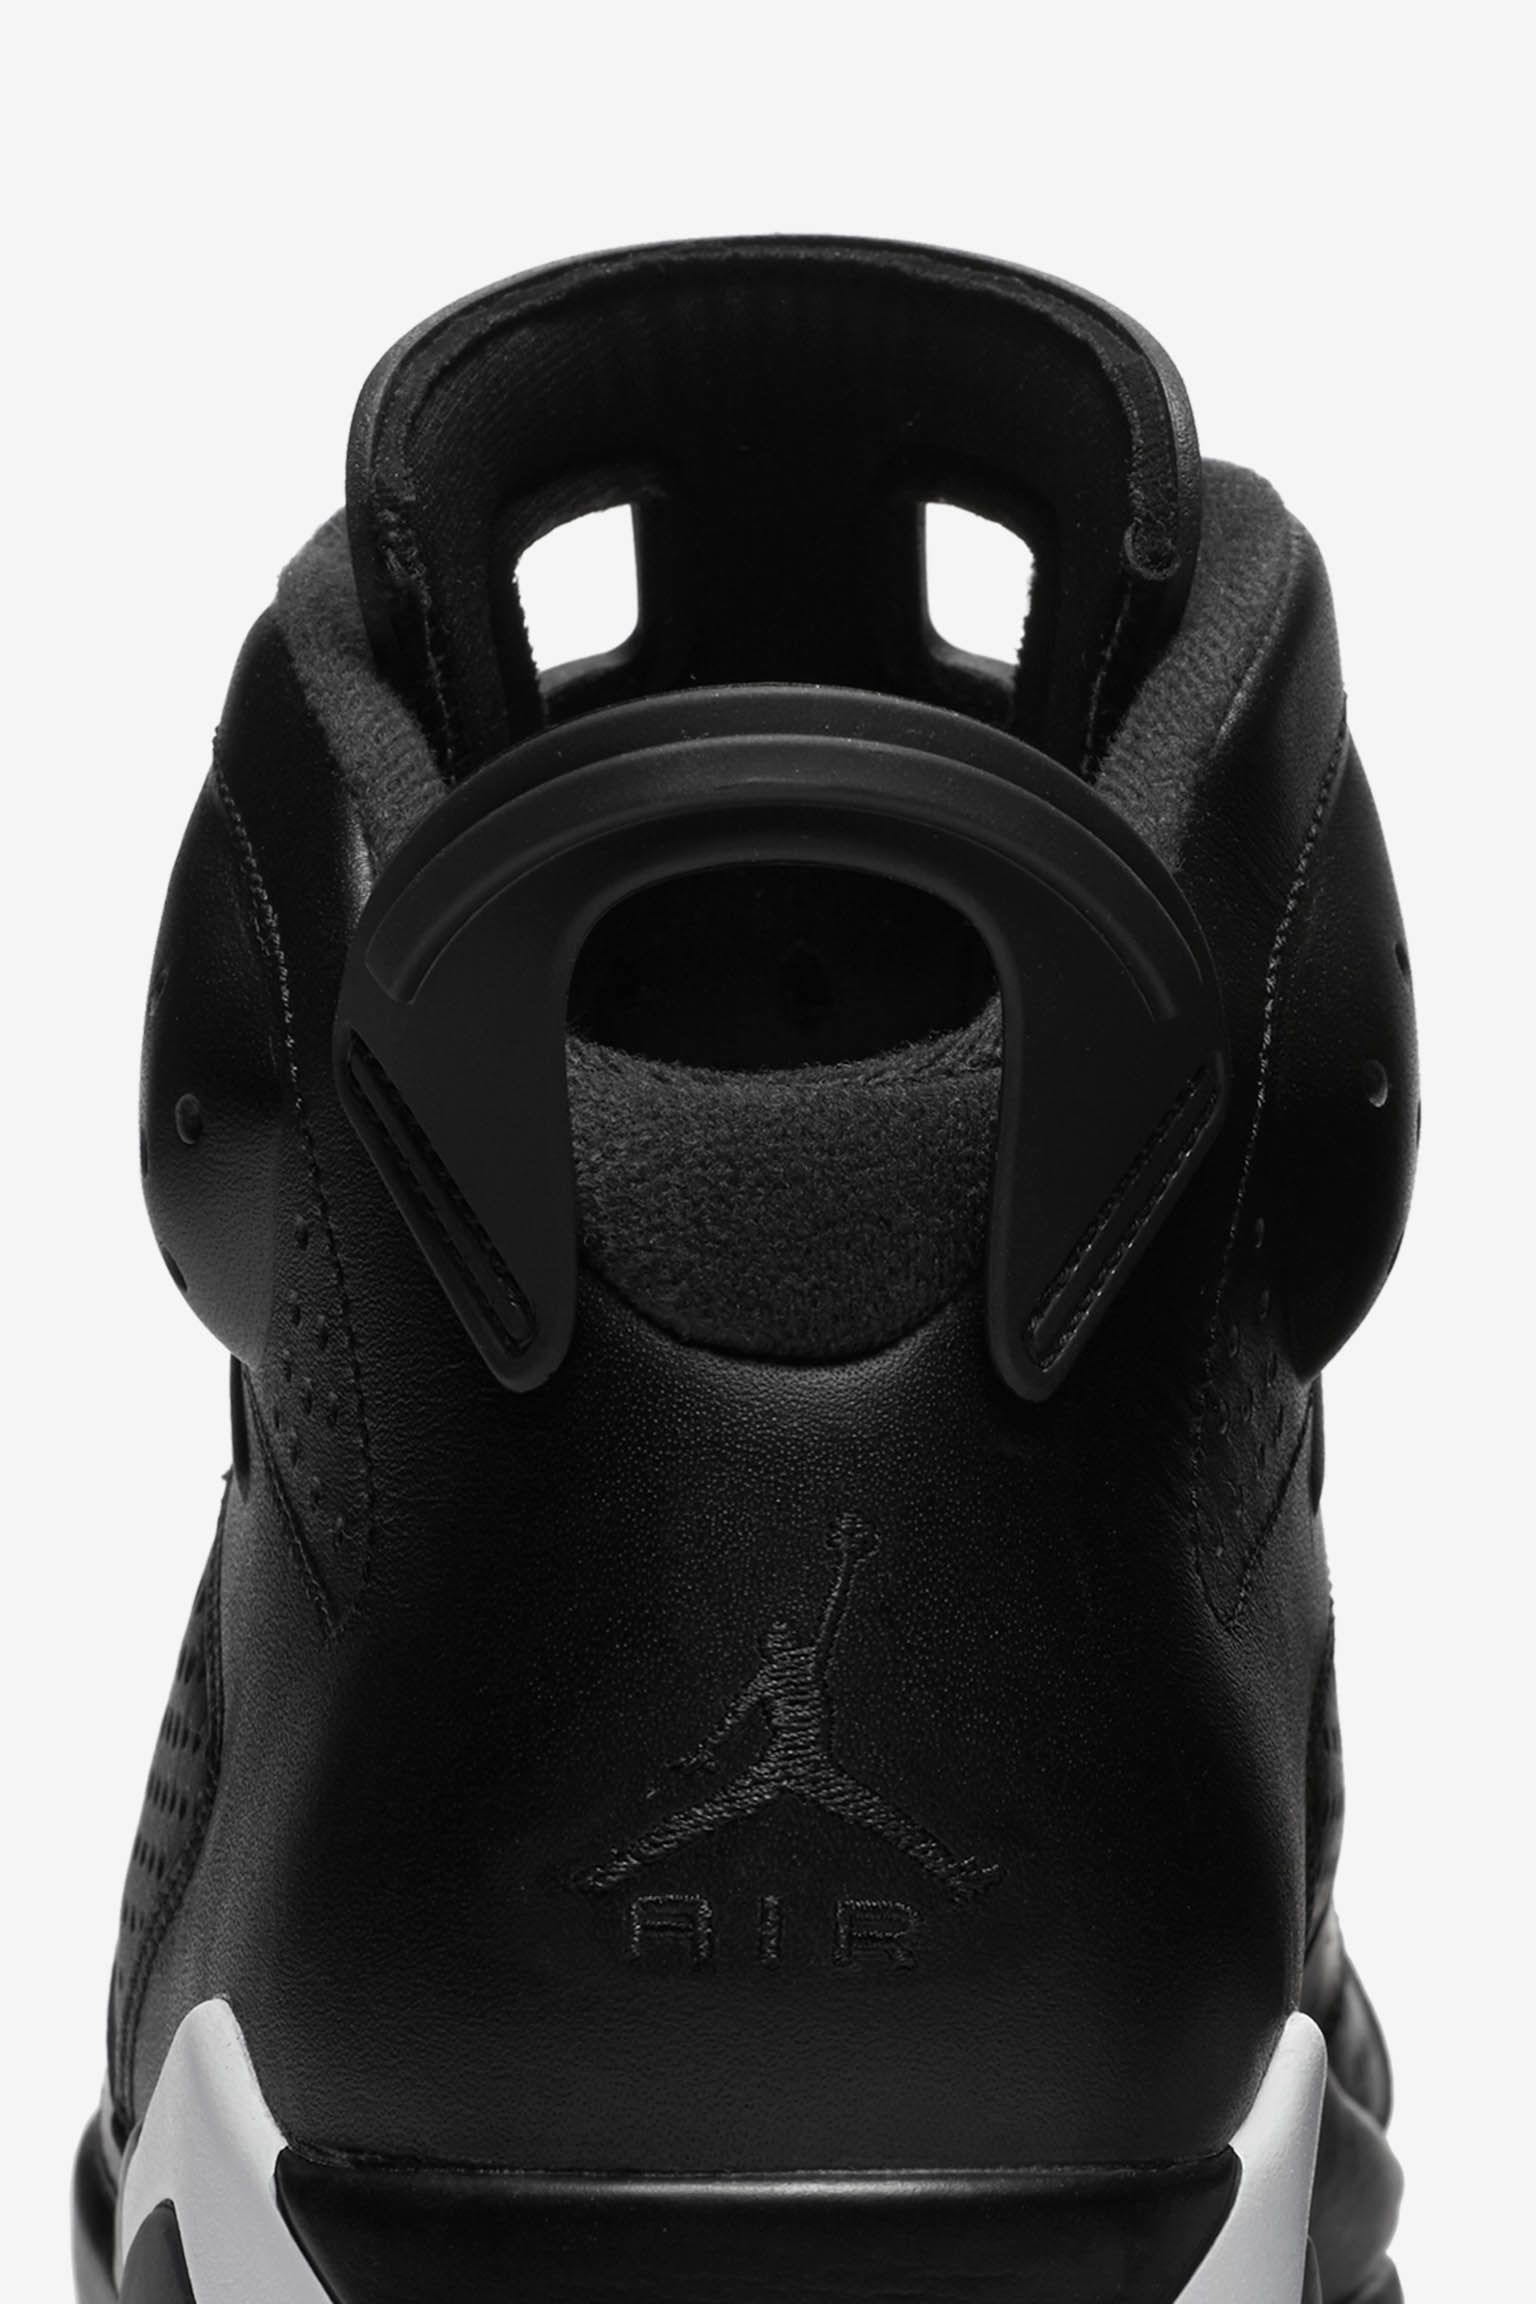 Air Jordan 6 Retro 'Black'. Nike SNKRS